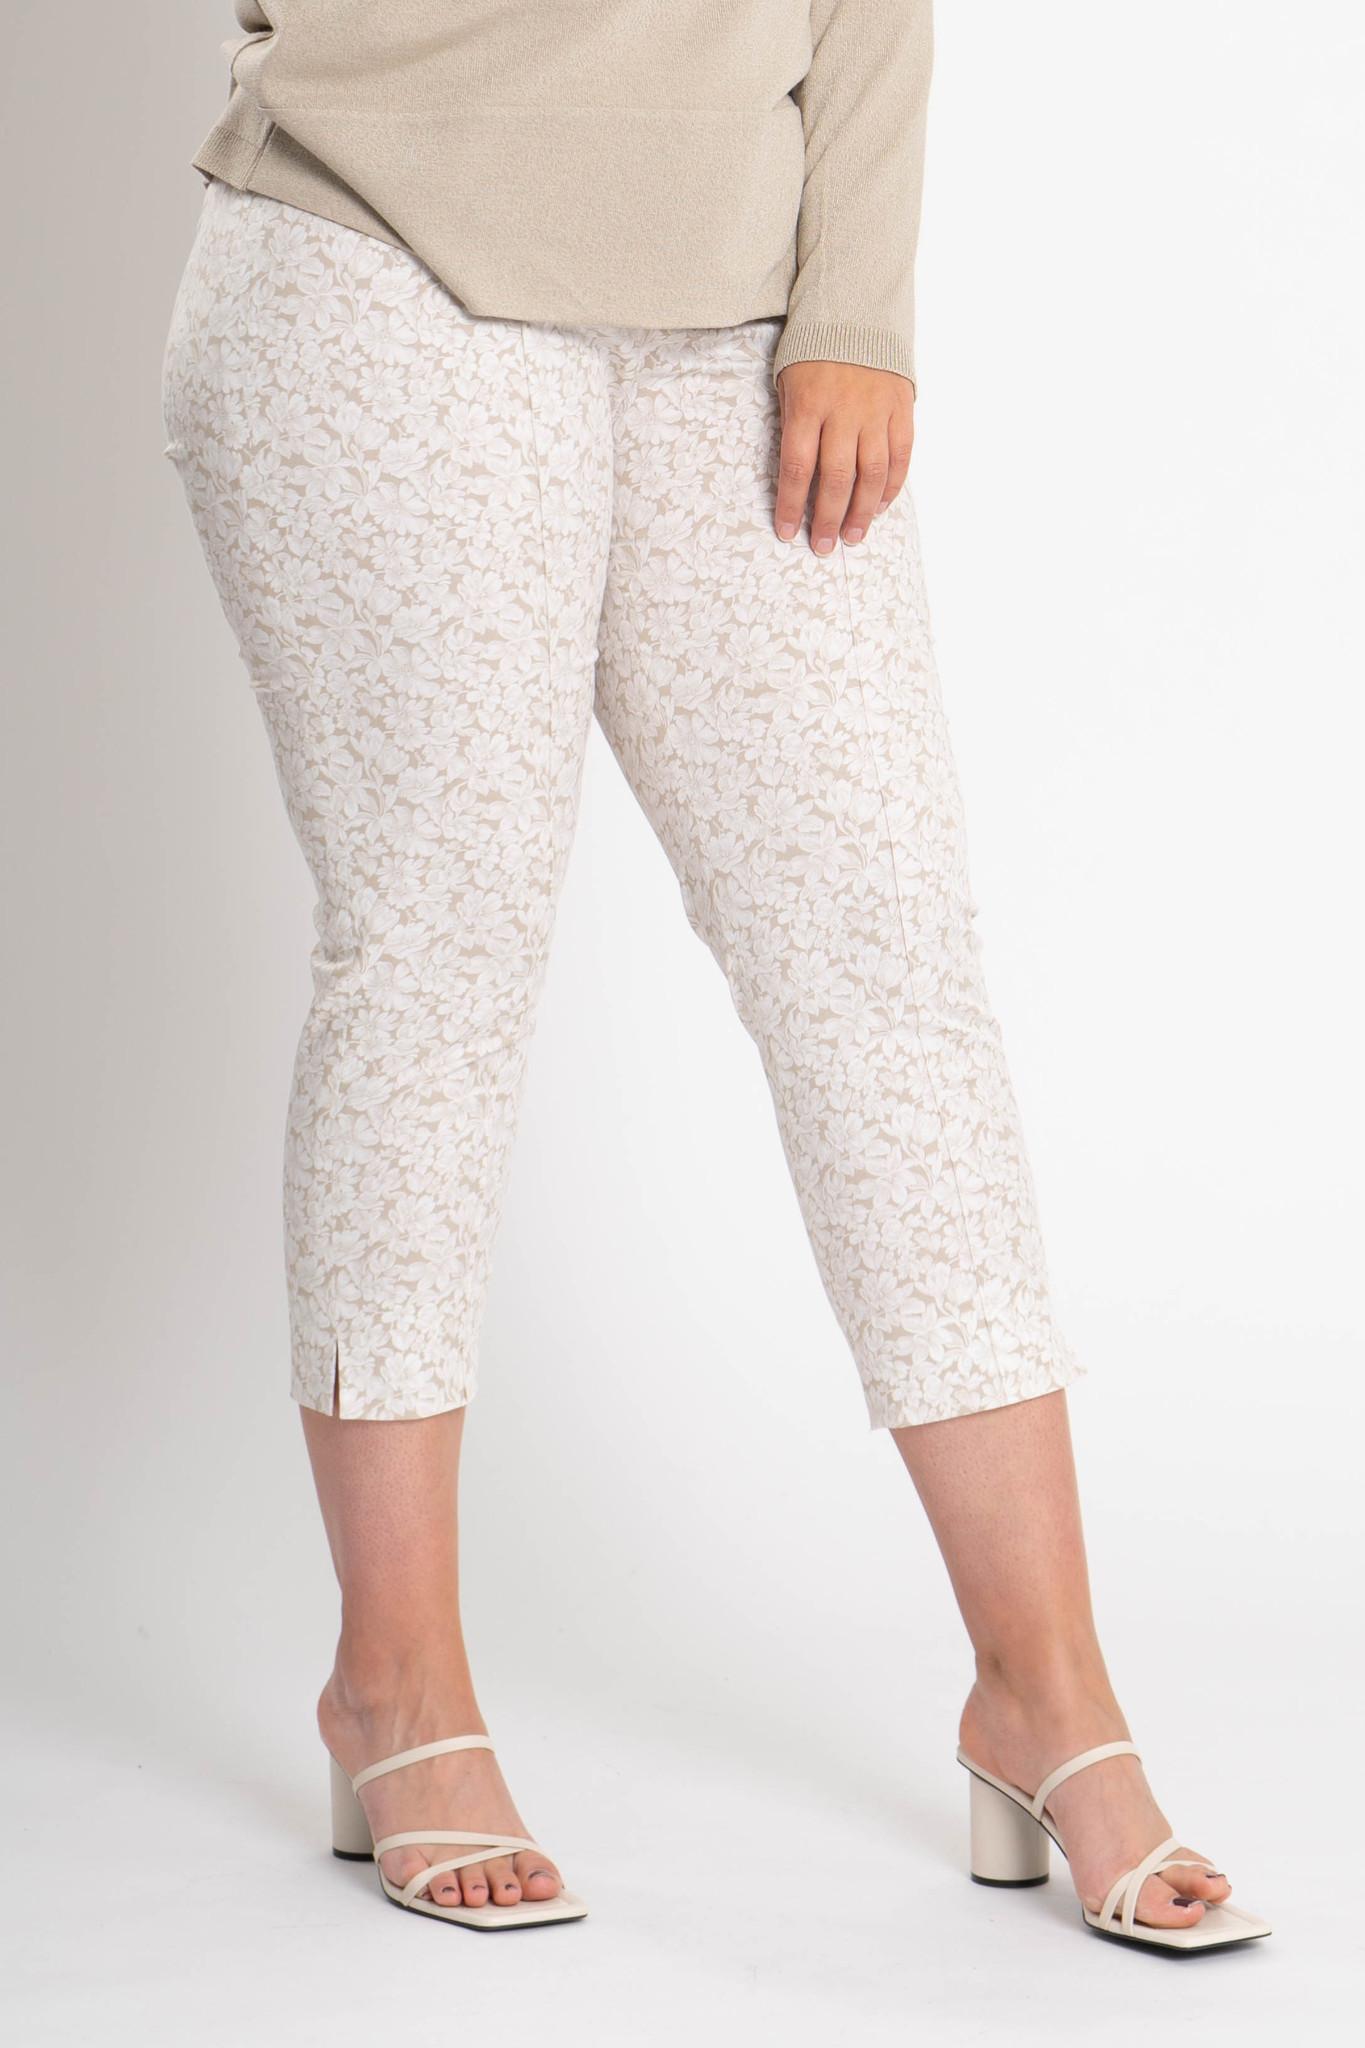 CAPRI Trousers in Cotton stretch-1